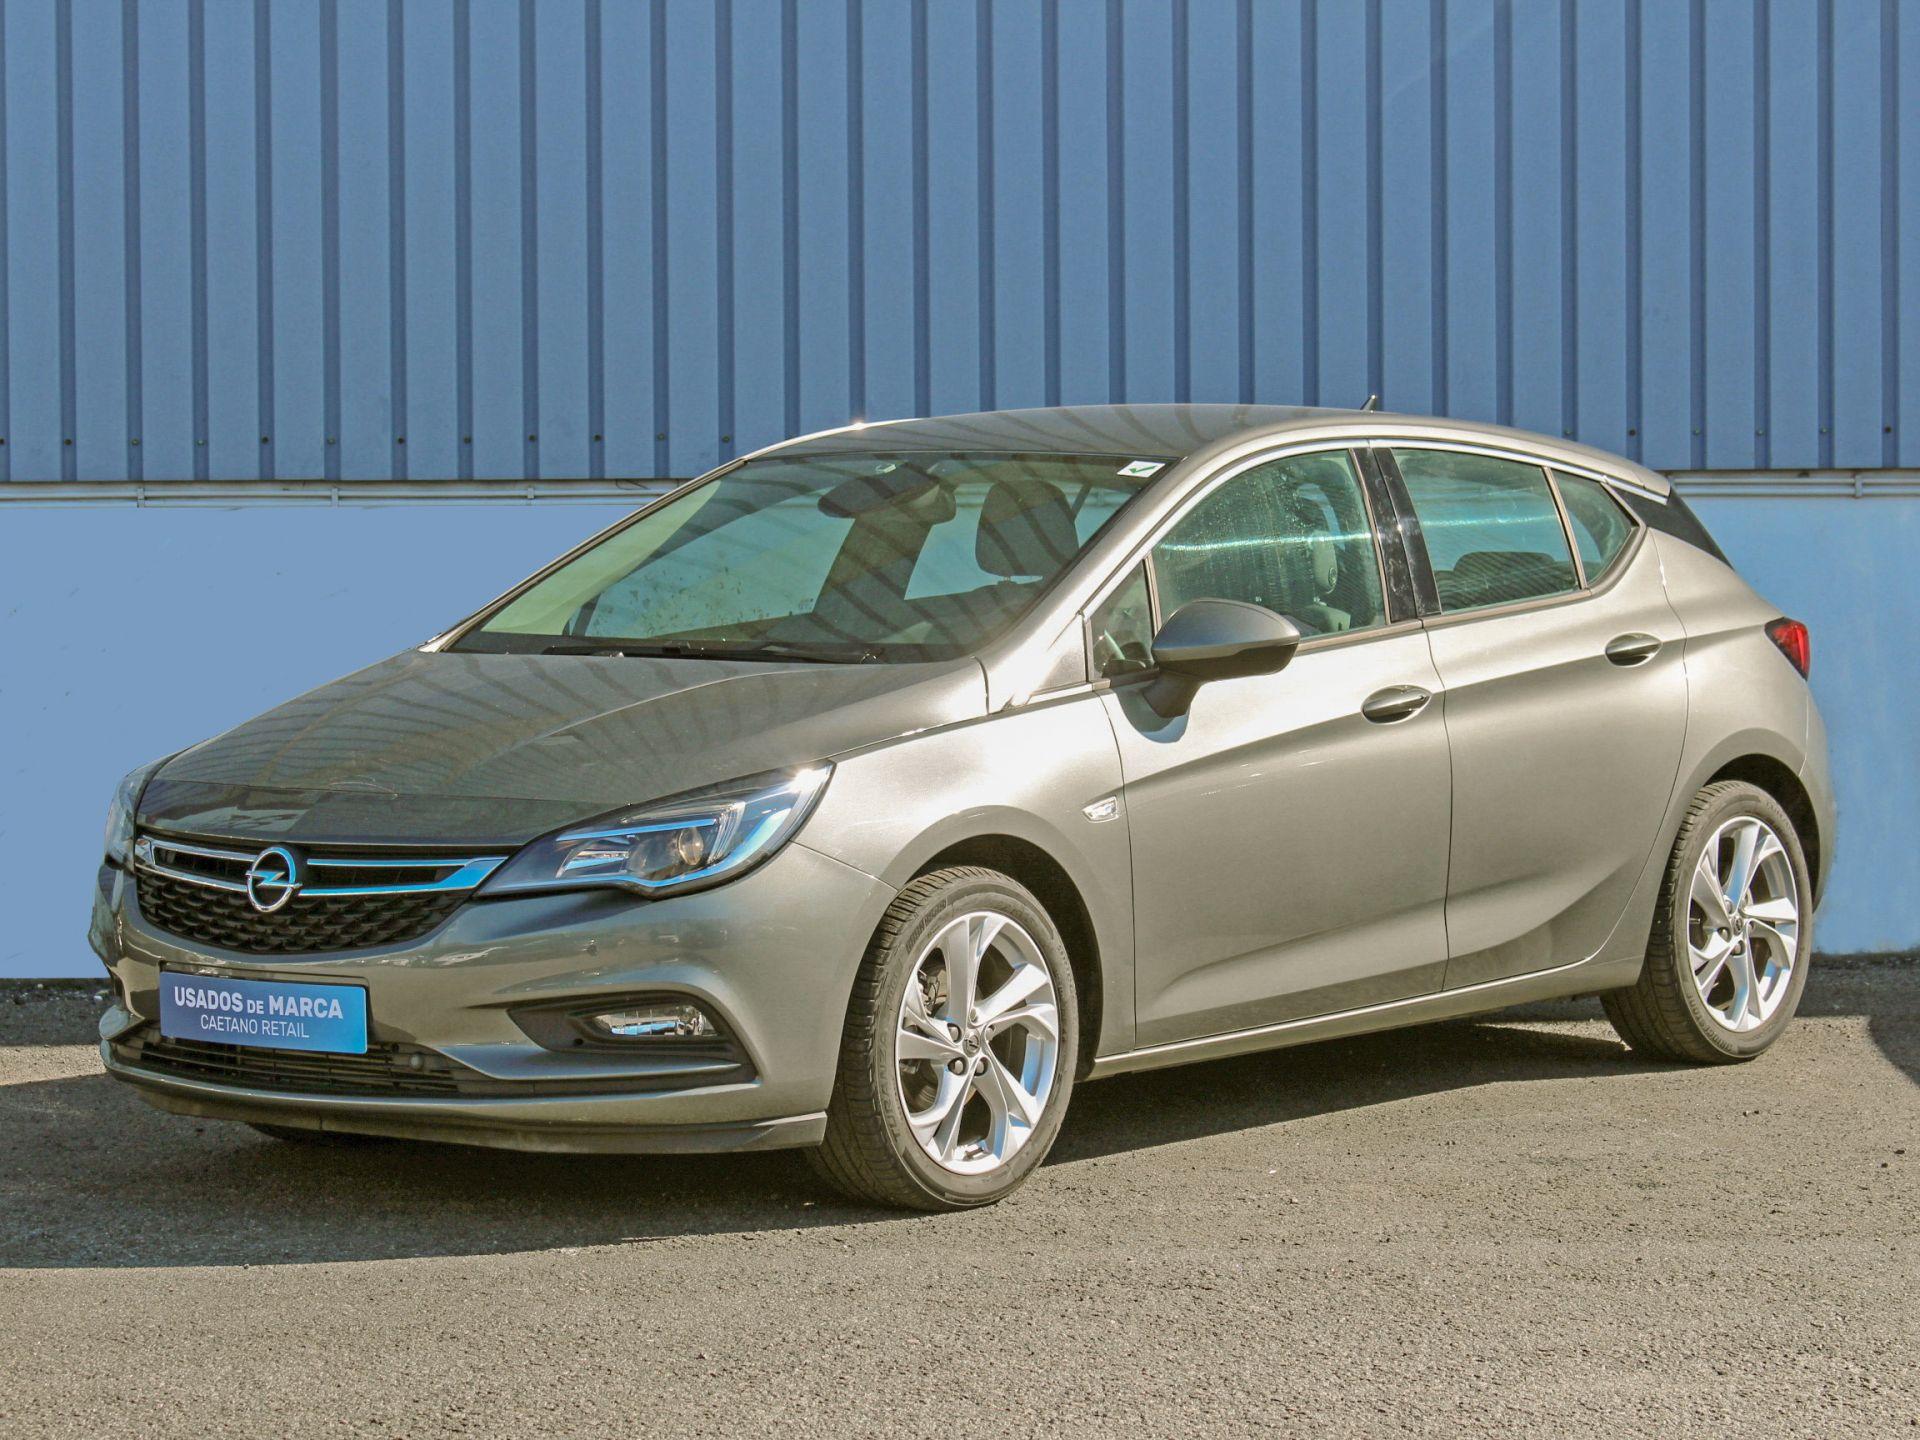 Opel Astra 1.0 Ecotec 105cv S/S Innovation usada Porto